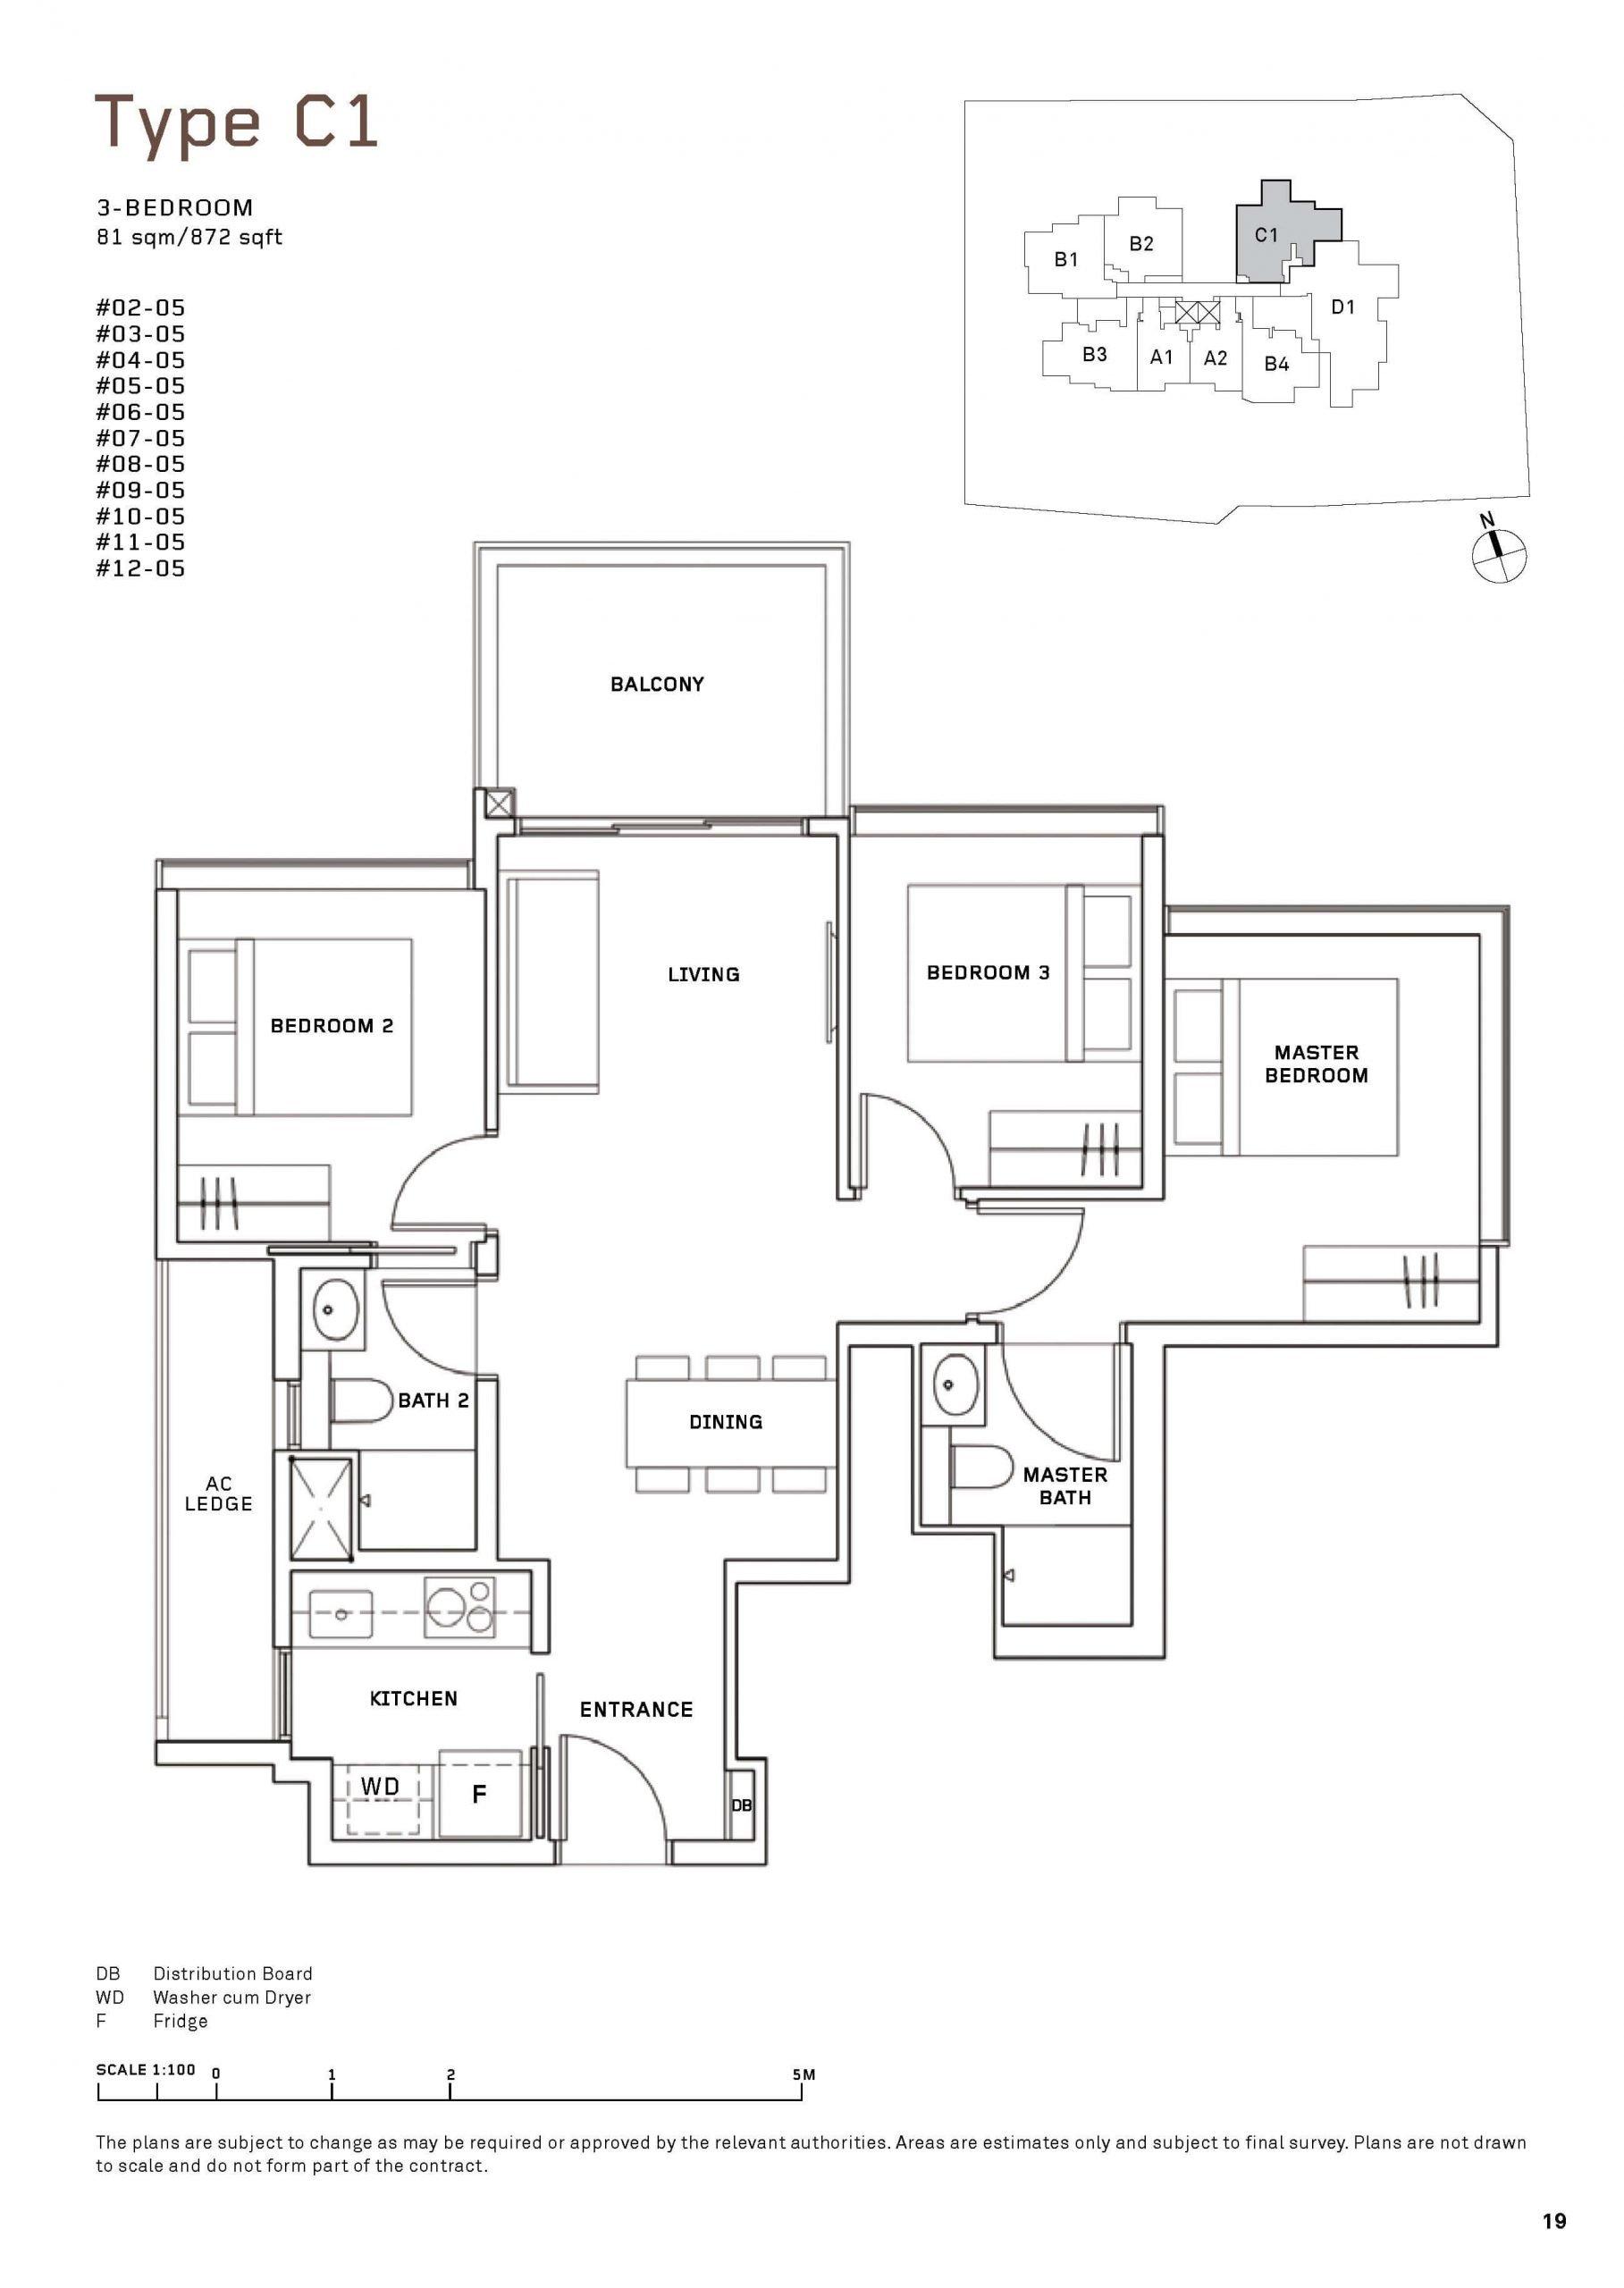 MYRA Condo Floor Plan 3 Bedroom scaled